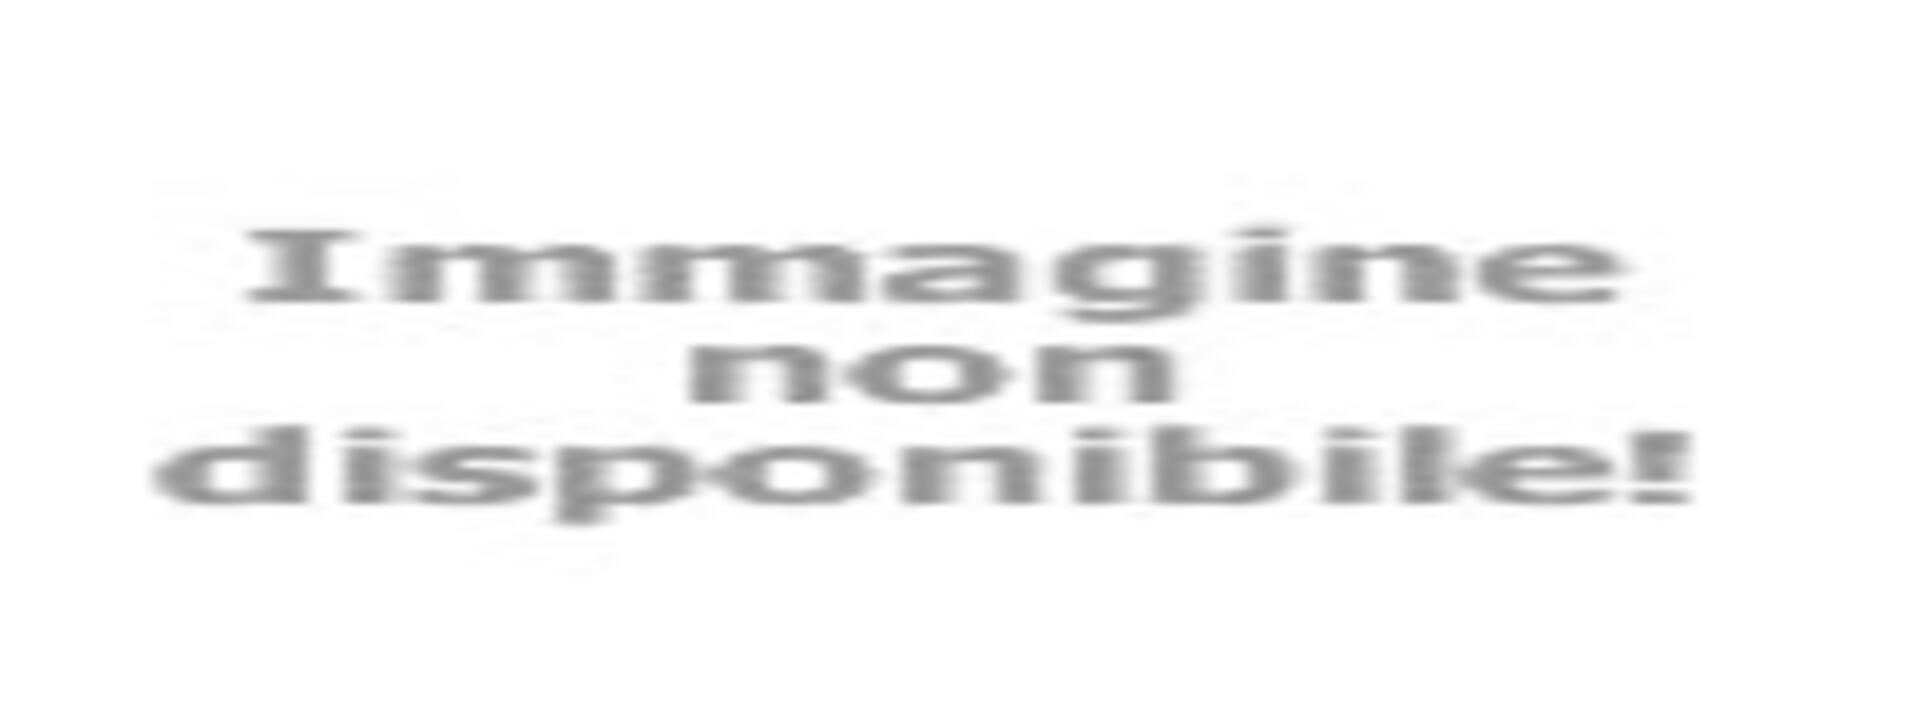 riccionepiadina it piadina-senza-glutine 001